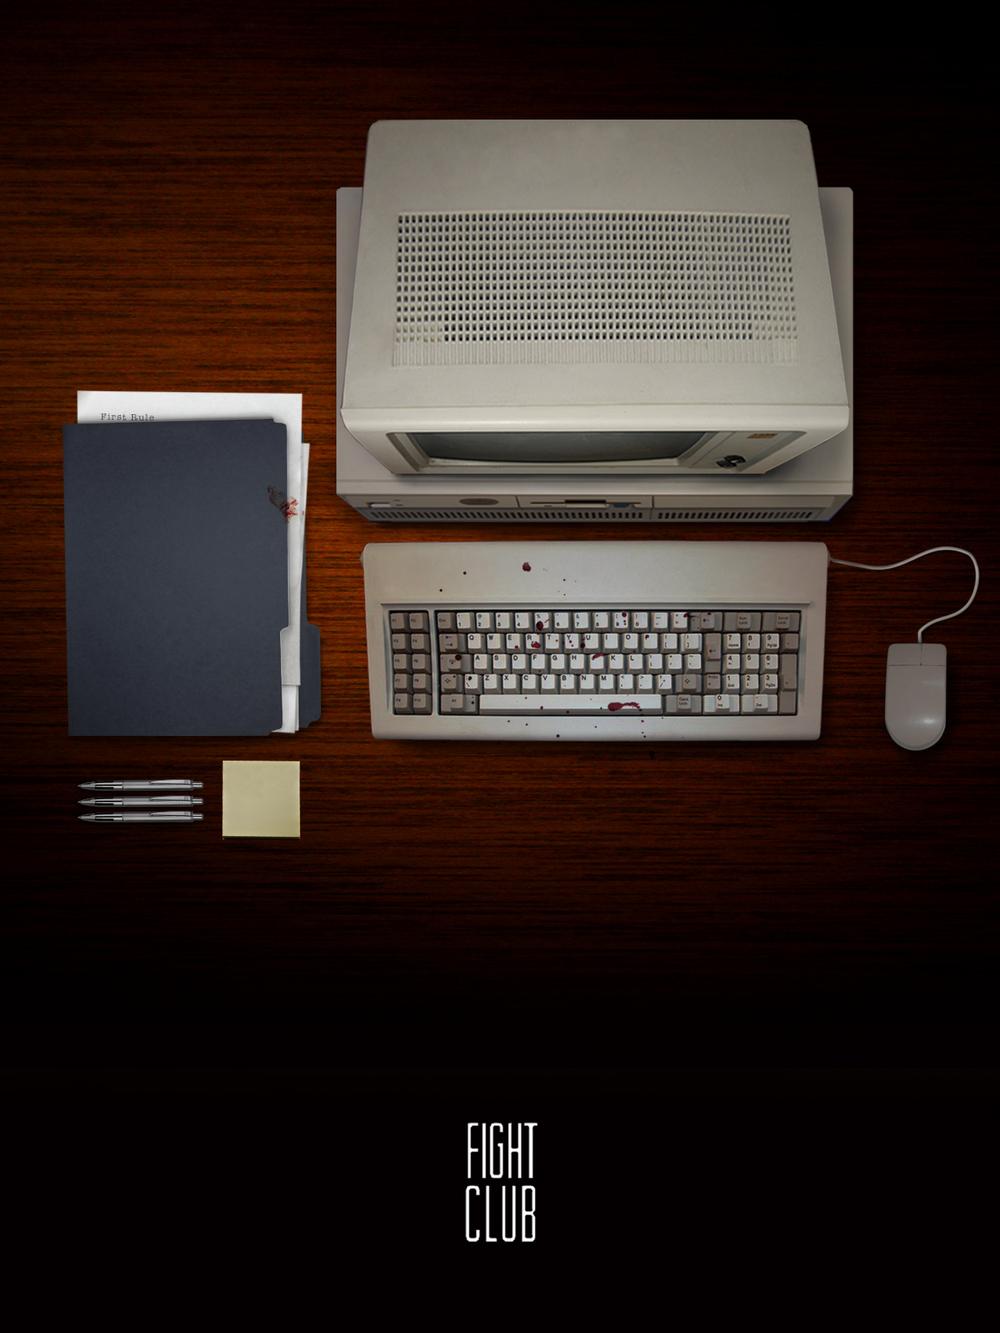 fightclub_minimal_poster